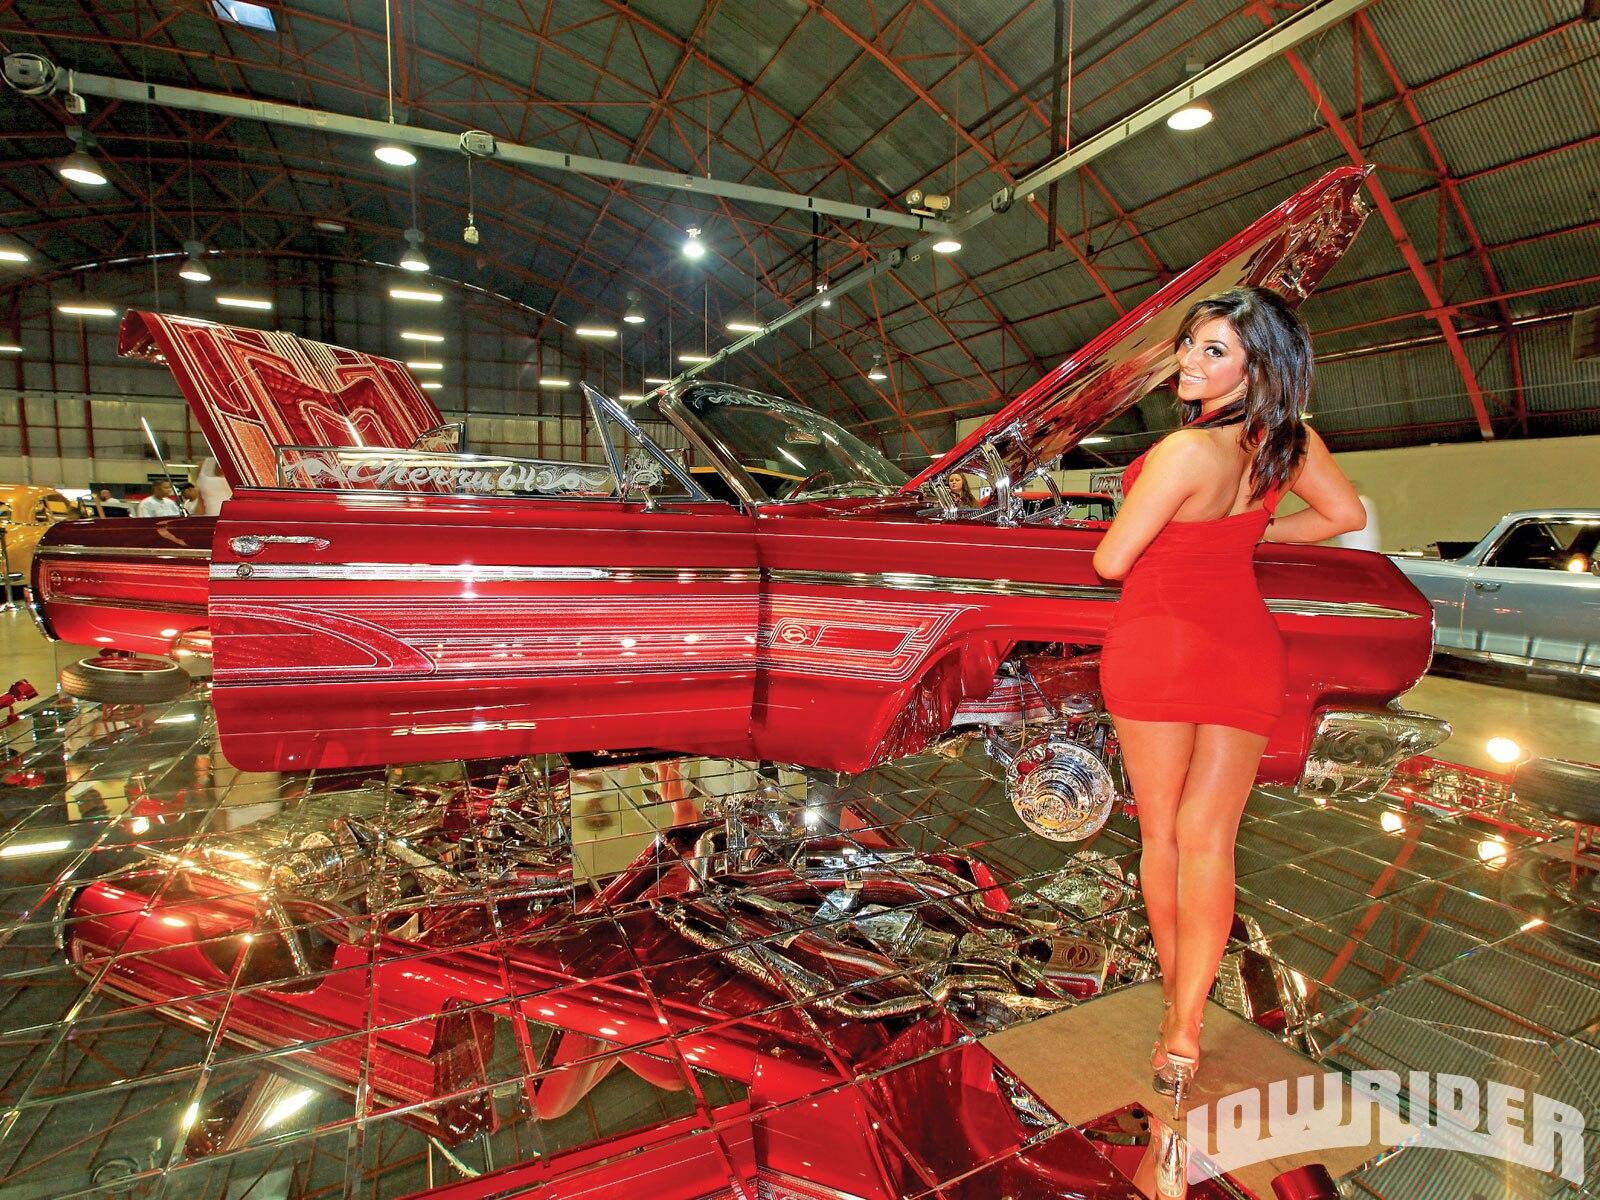 1009-lrmp-01-z-lolystics-5th-annual-super-show-model